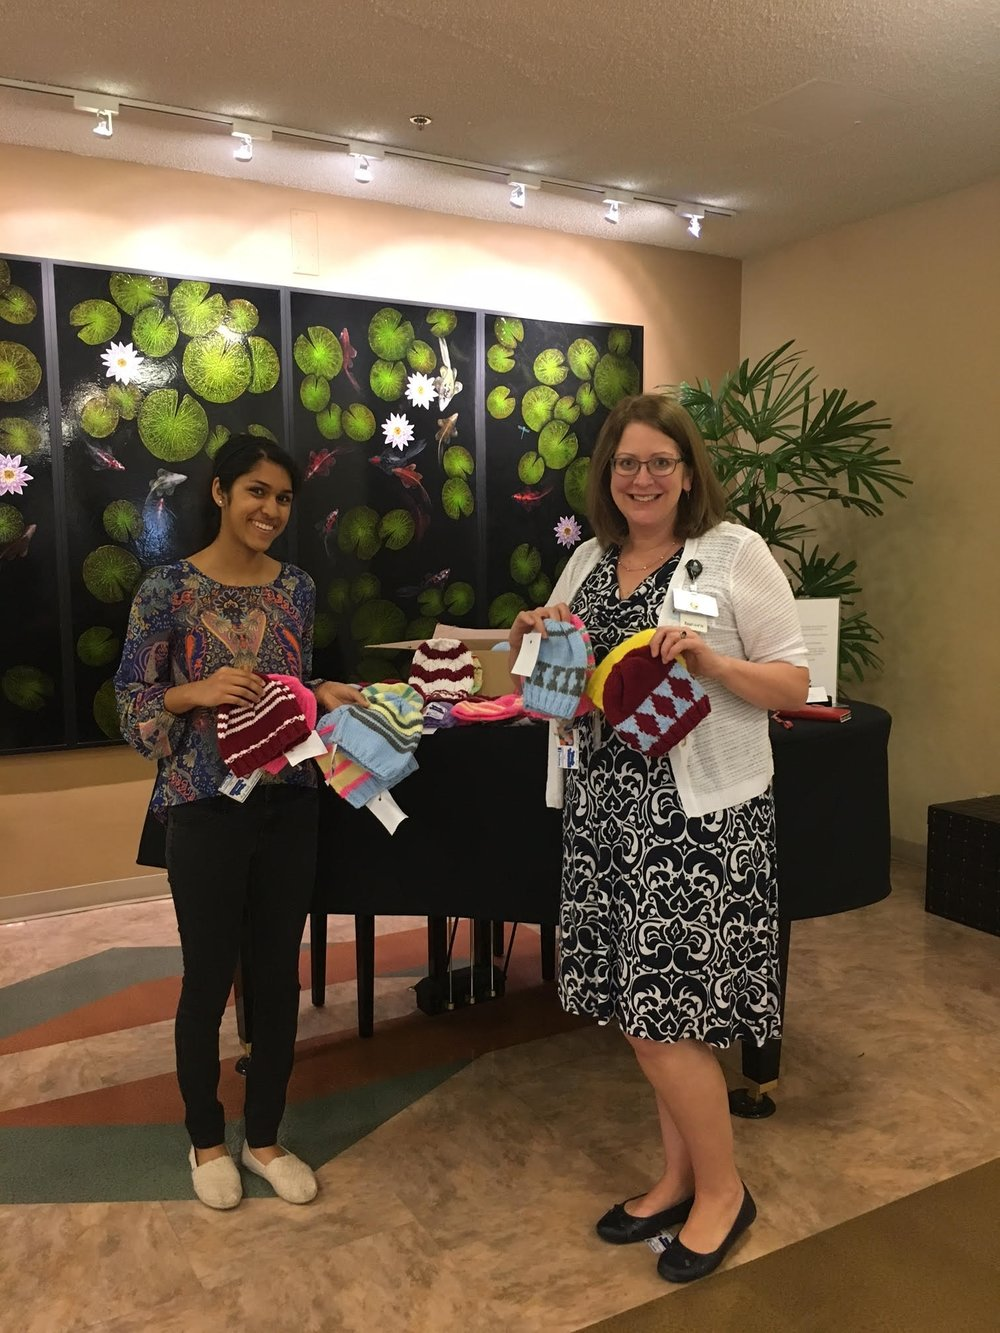 Nikita Salunke making a donation to Ms. Susan Lauer, Director of Volunteer Services, Good Samaritan Hospital